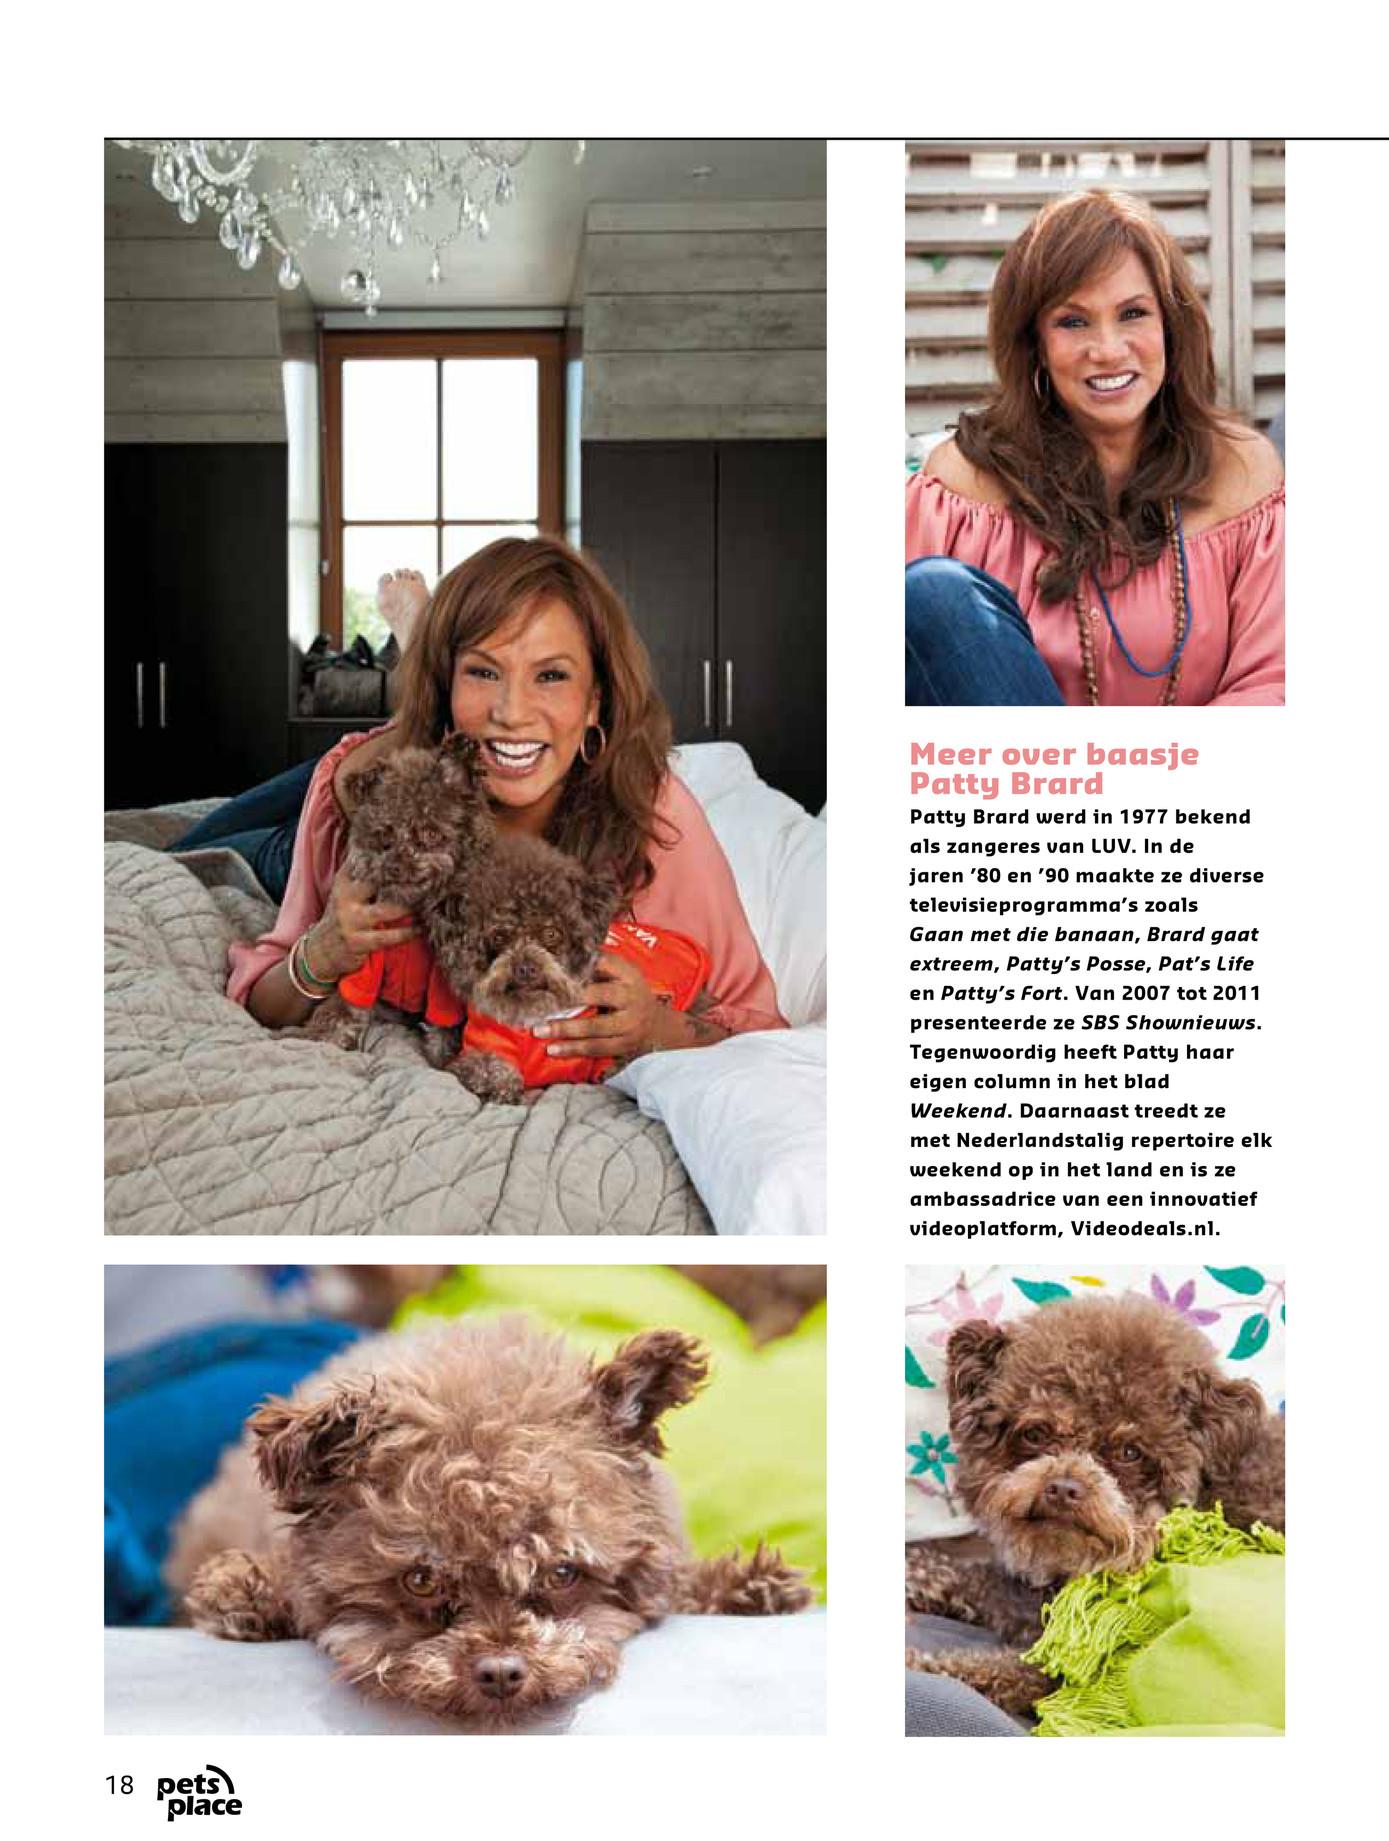 Petsplace magazine ld03 2012 pagina 18 19 for Interieur huis patty brard